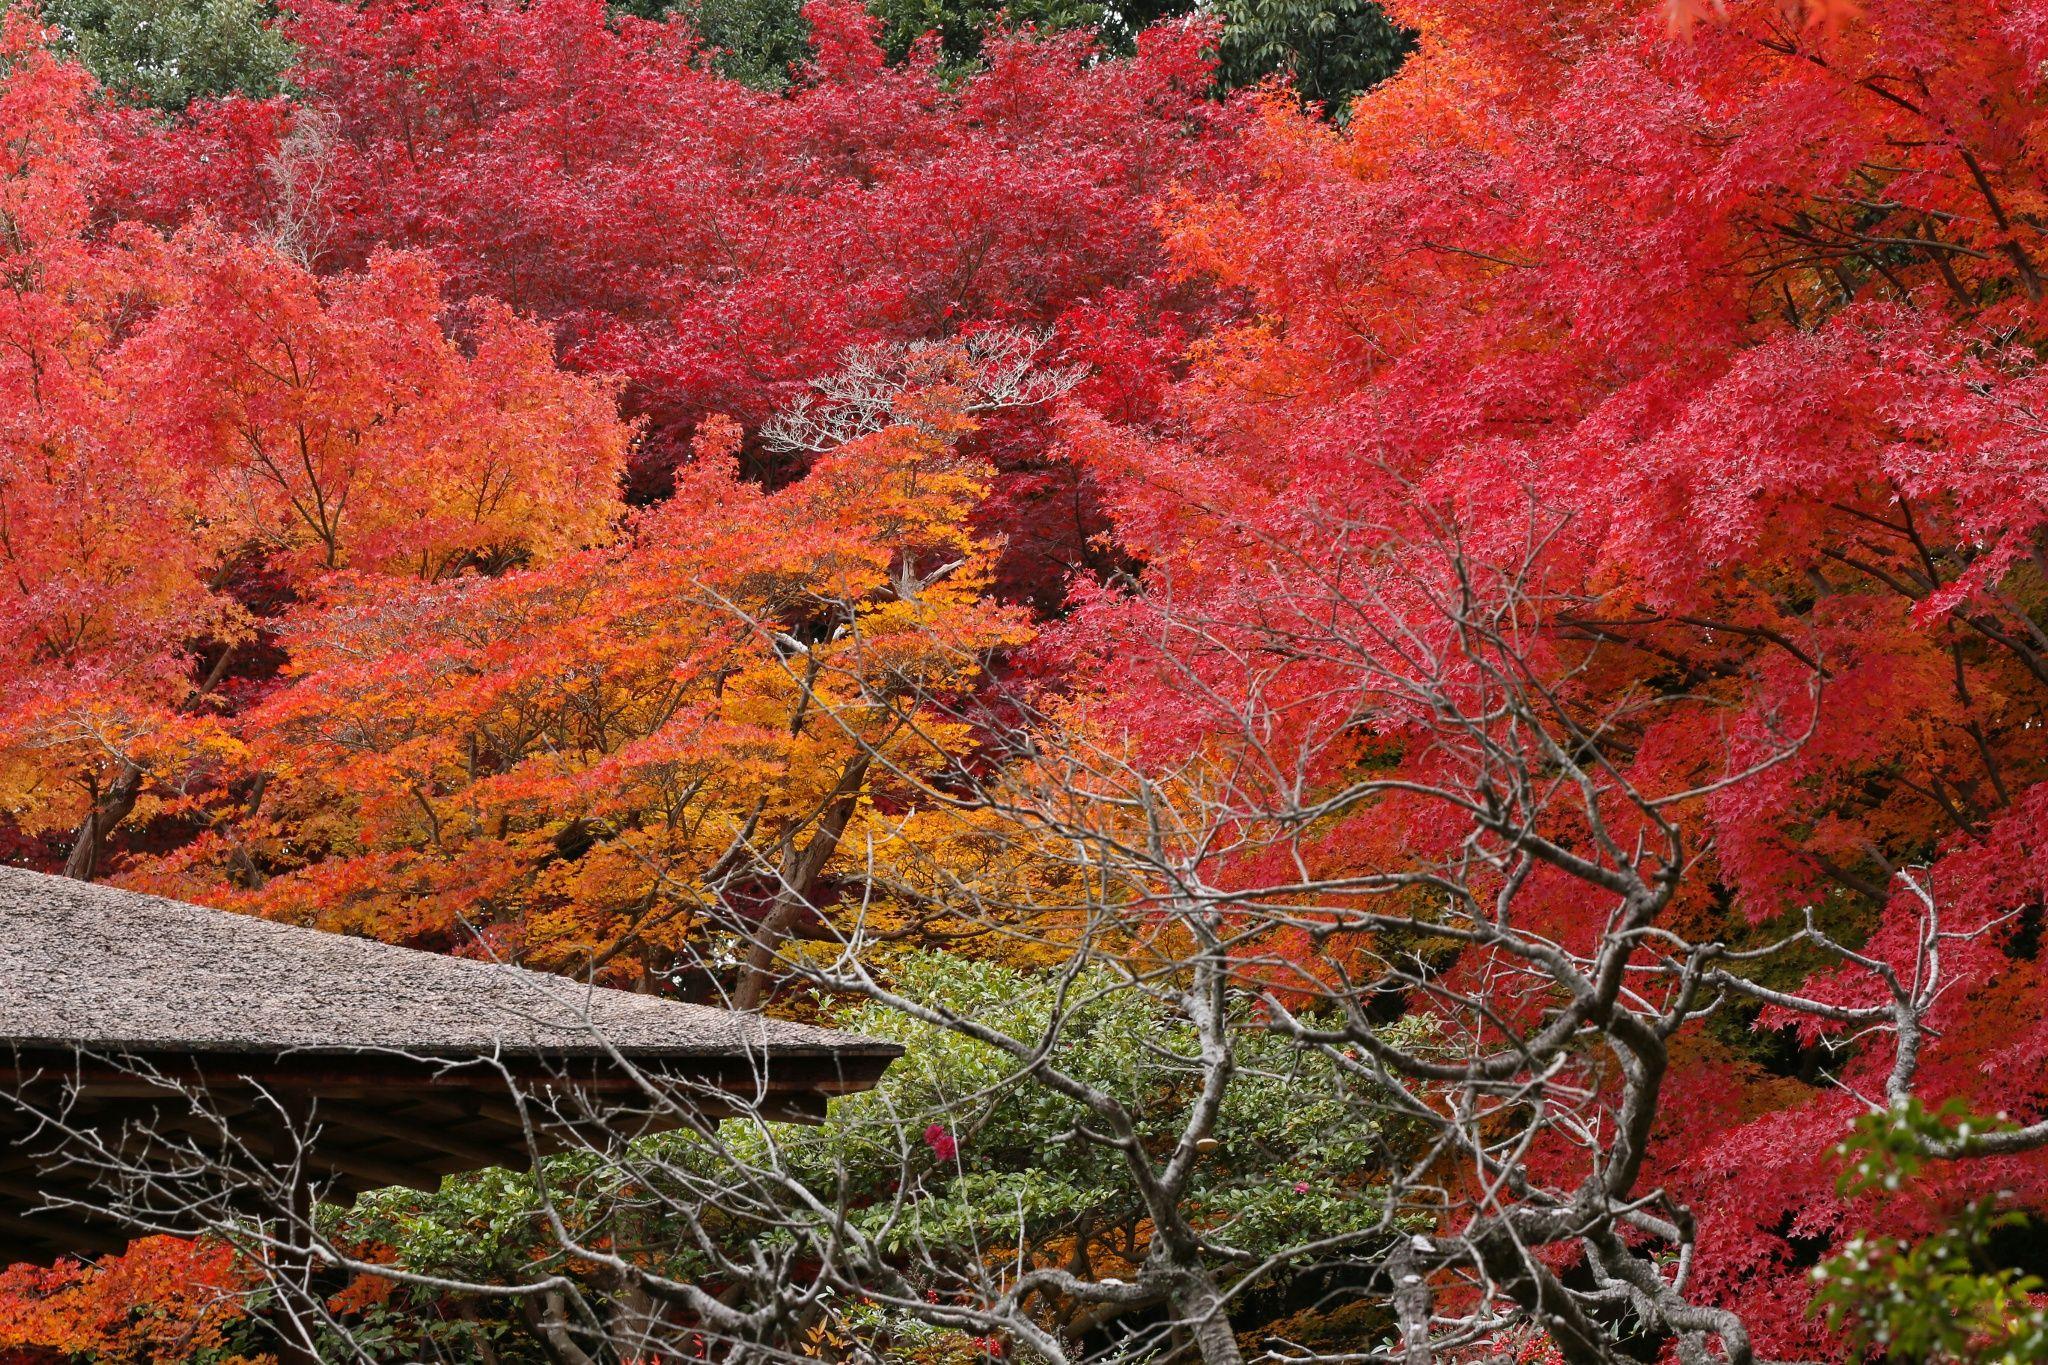 Tea House in Autumn by Takashi Imaoka on 500px